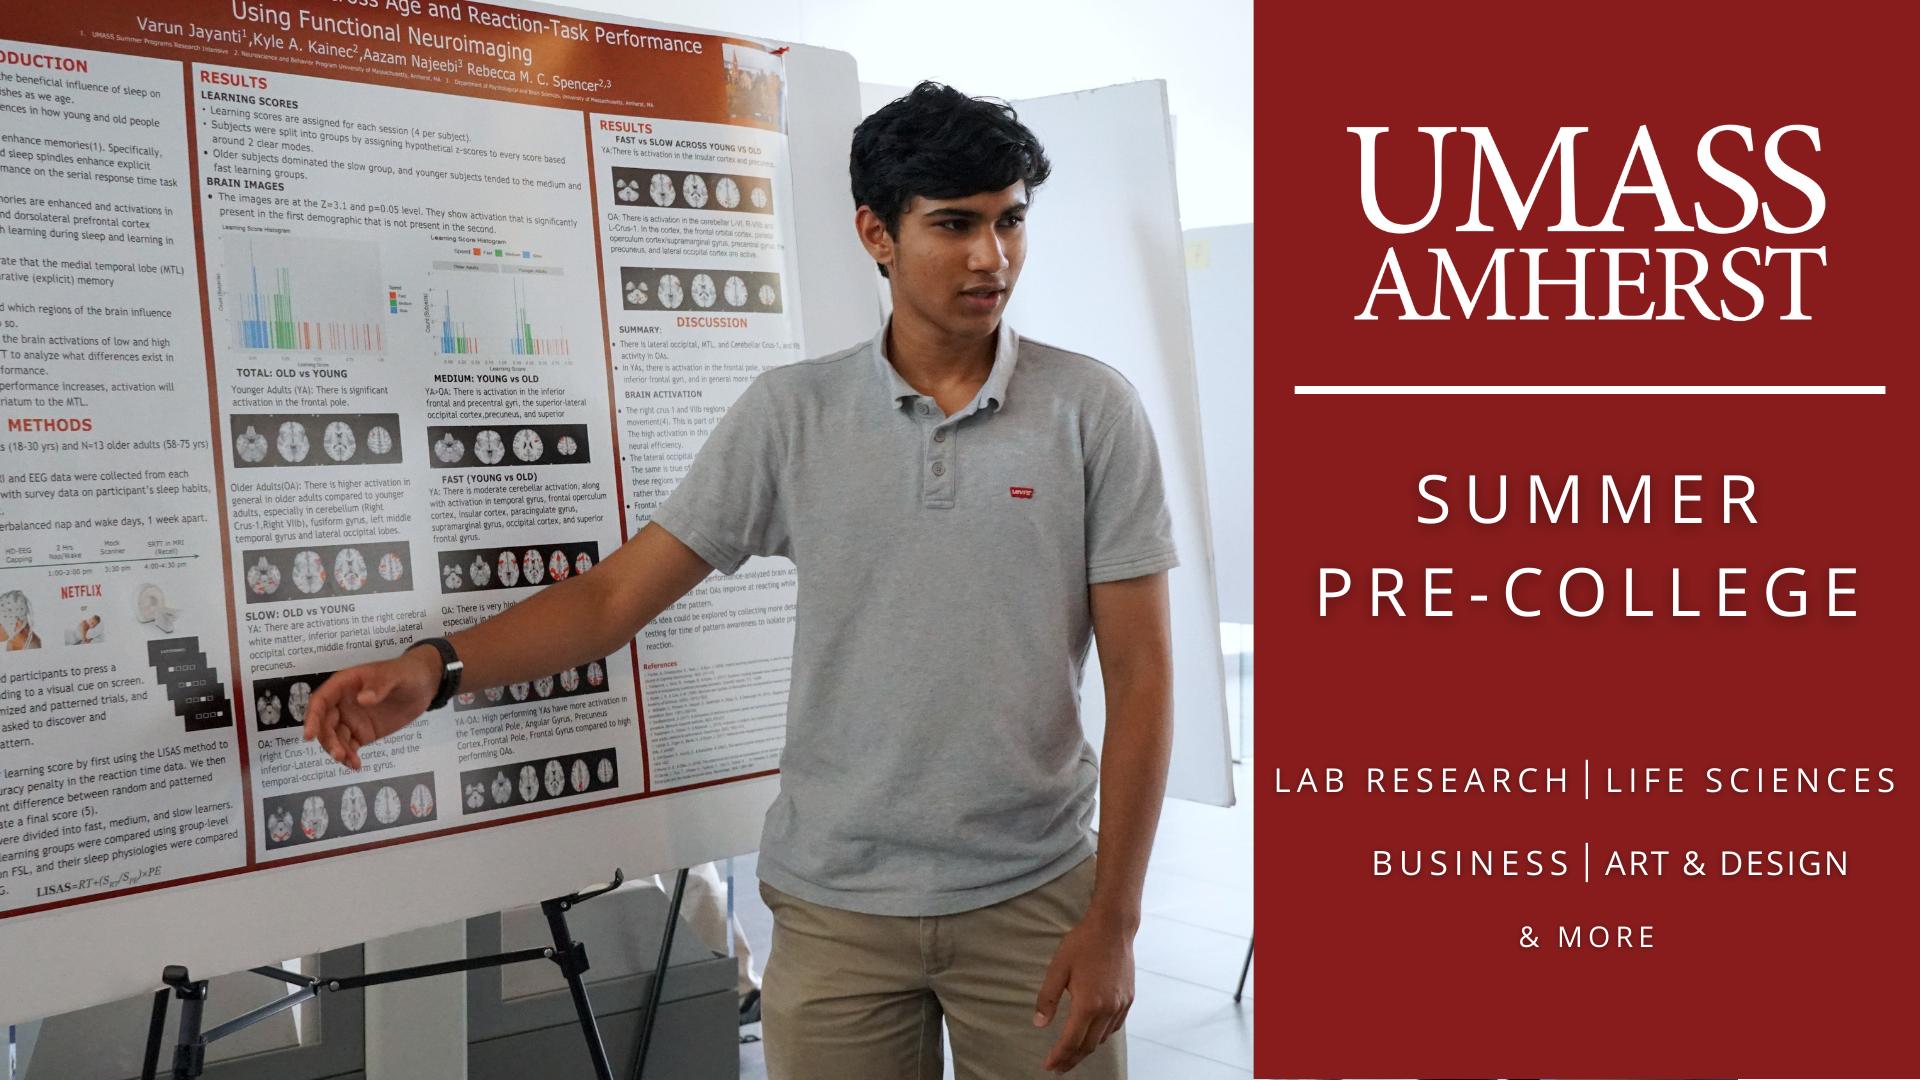 UMass Amherst Summer Pre-College: Veterinary Technology